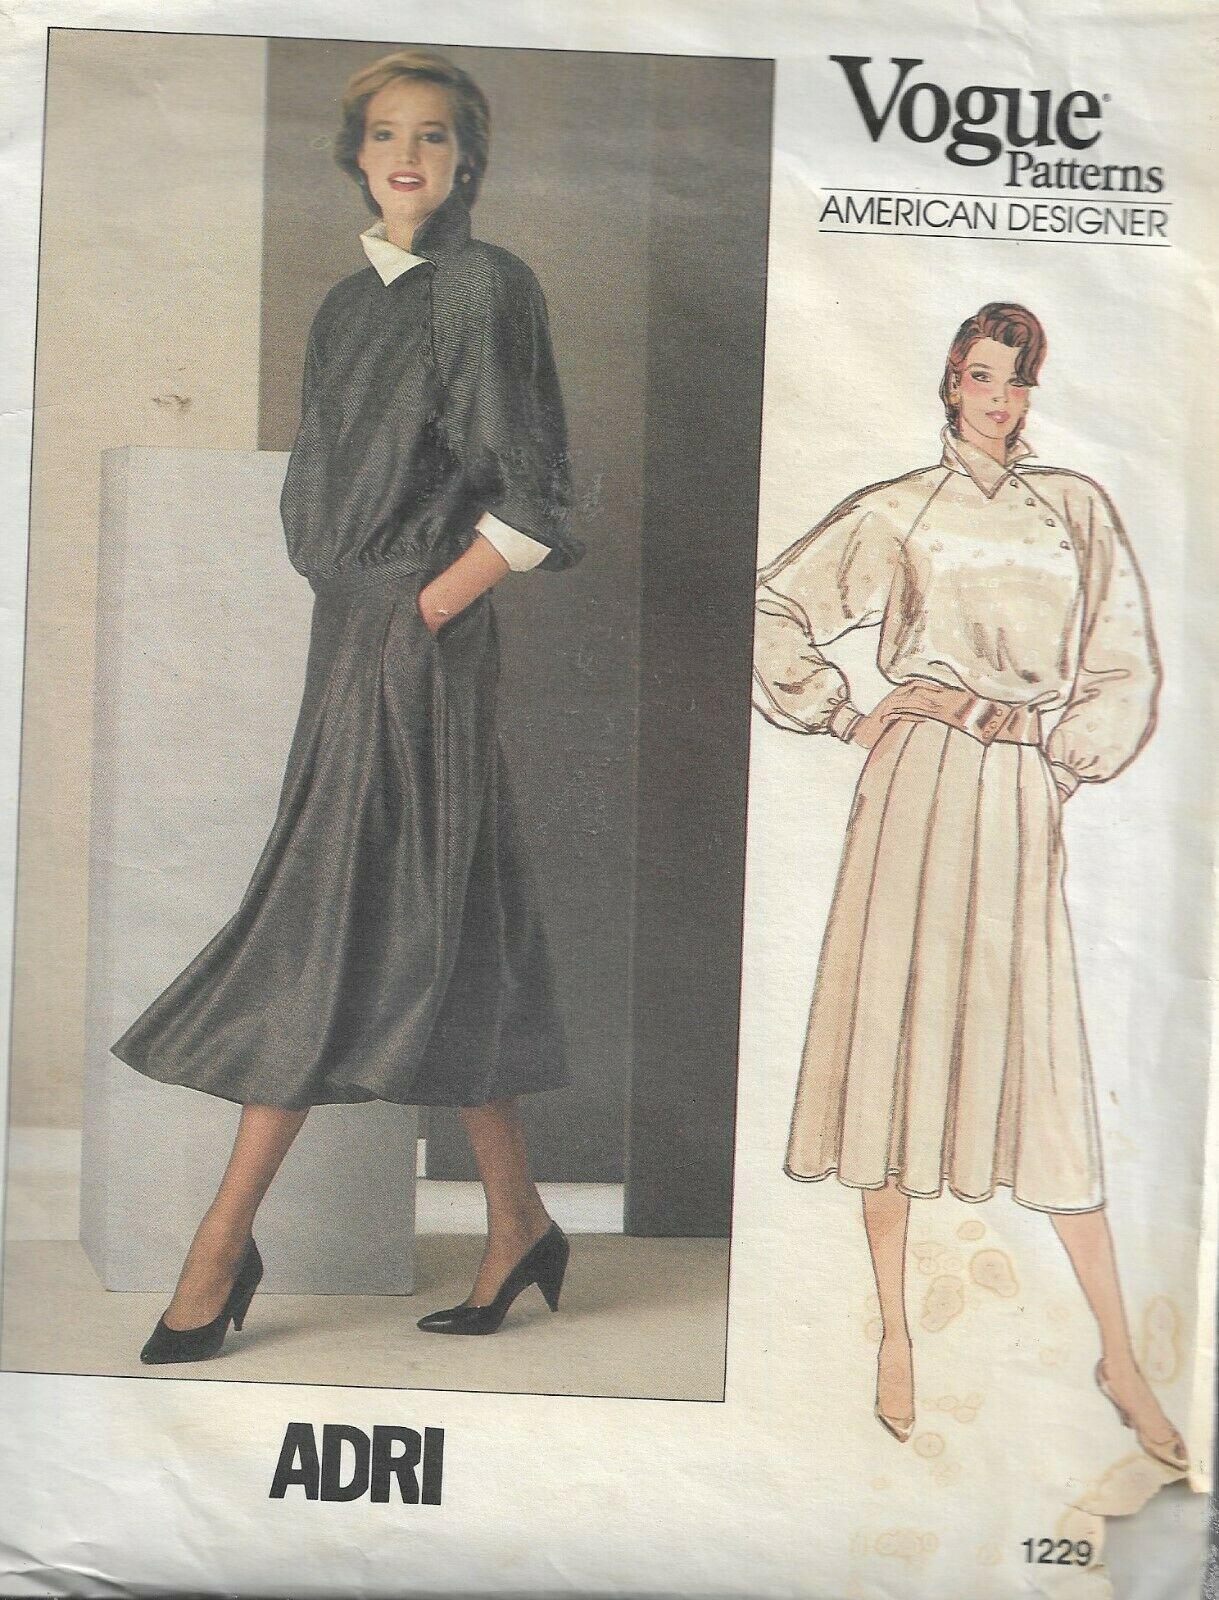 Vintage VOGUE American Designer ADRI Pattern #1229-Misses Top & Skirt Sz 8